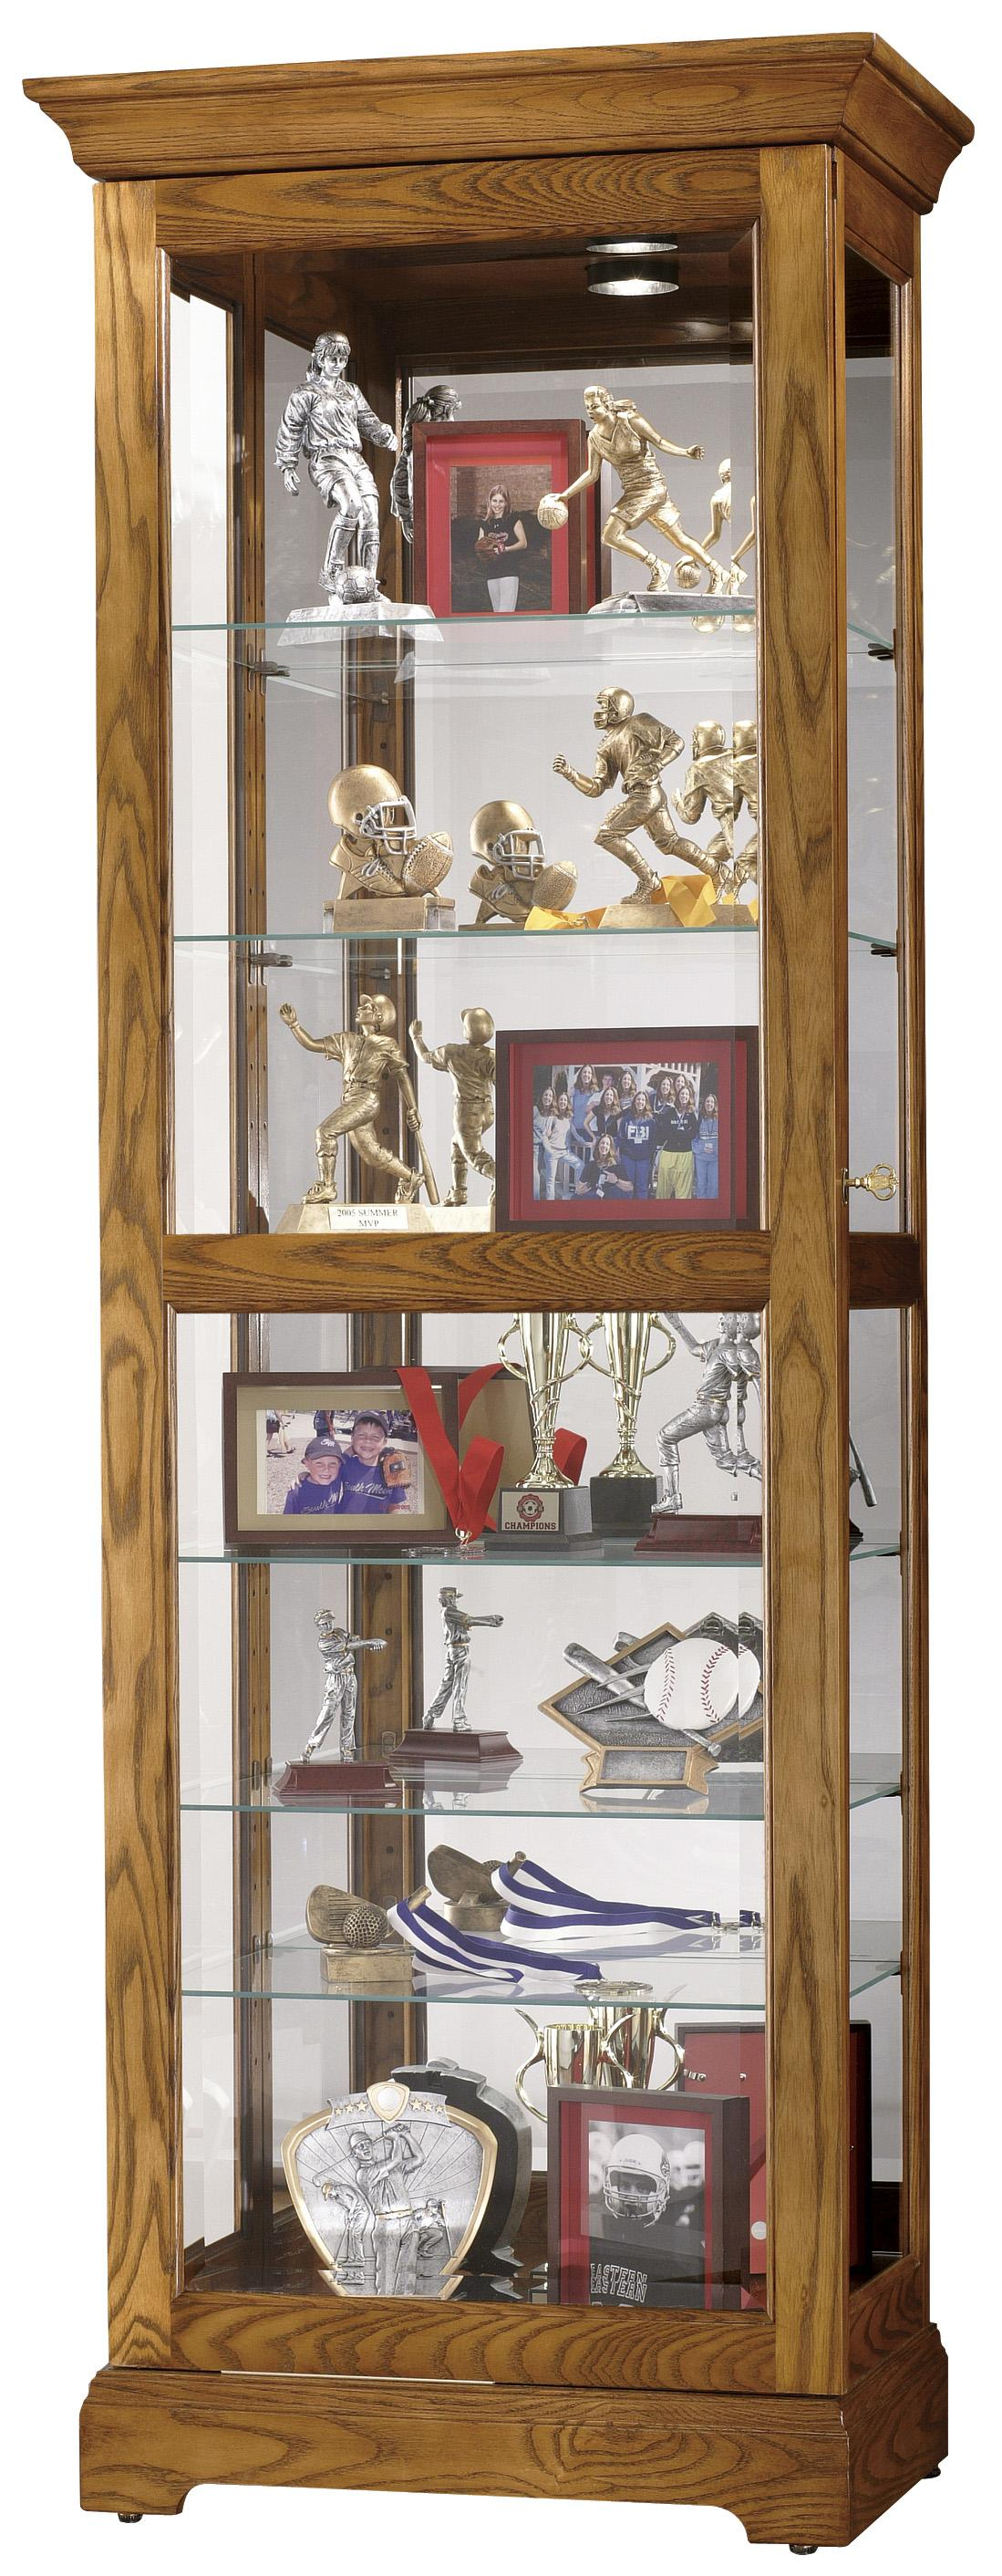 Furniture Trend Designs Curios Moorland Display Cabinet at Rotmans